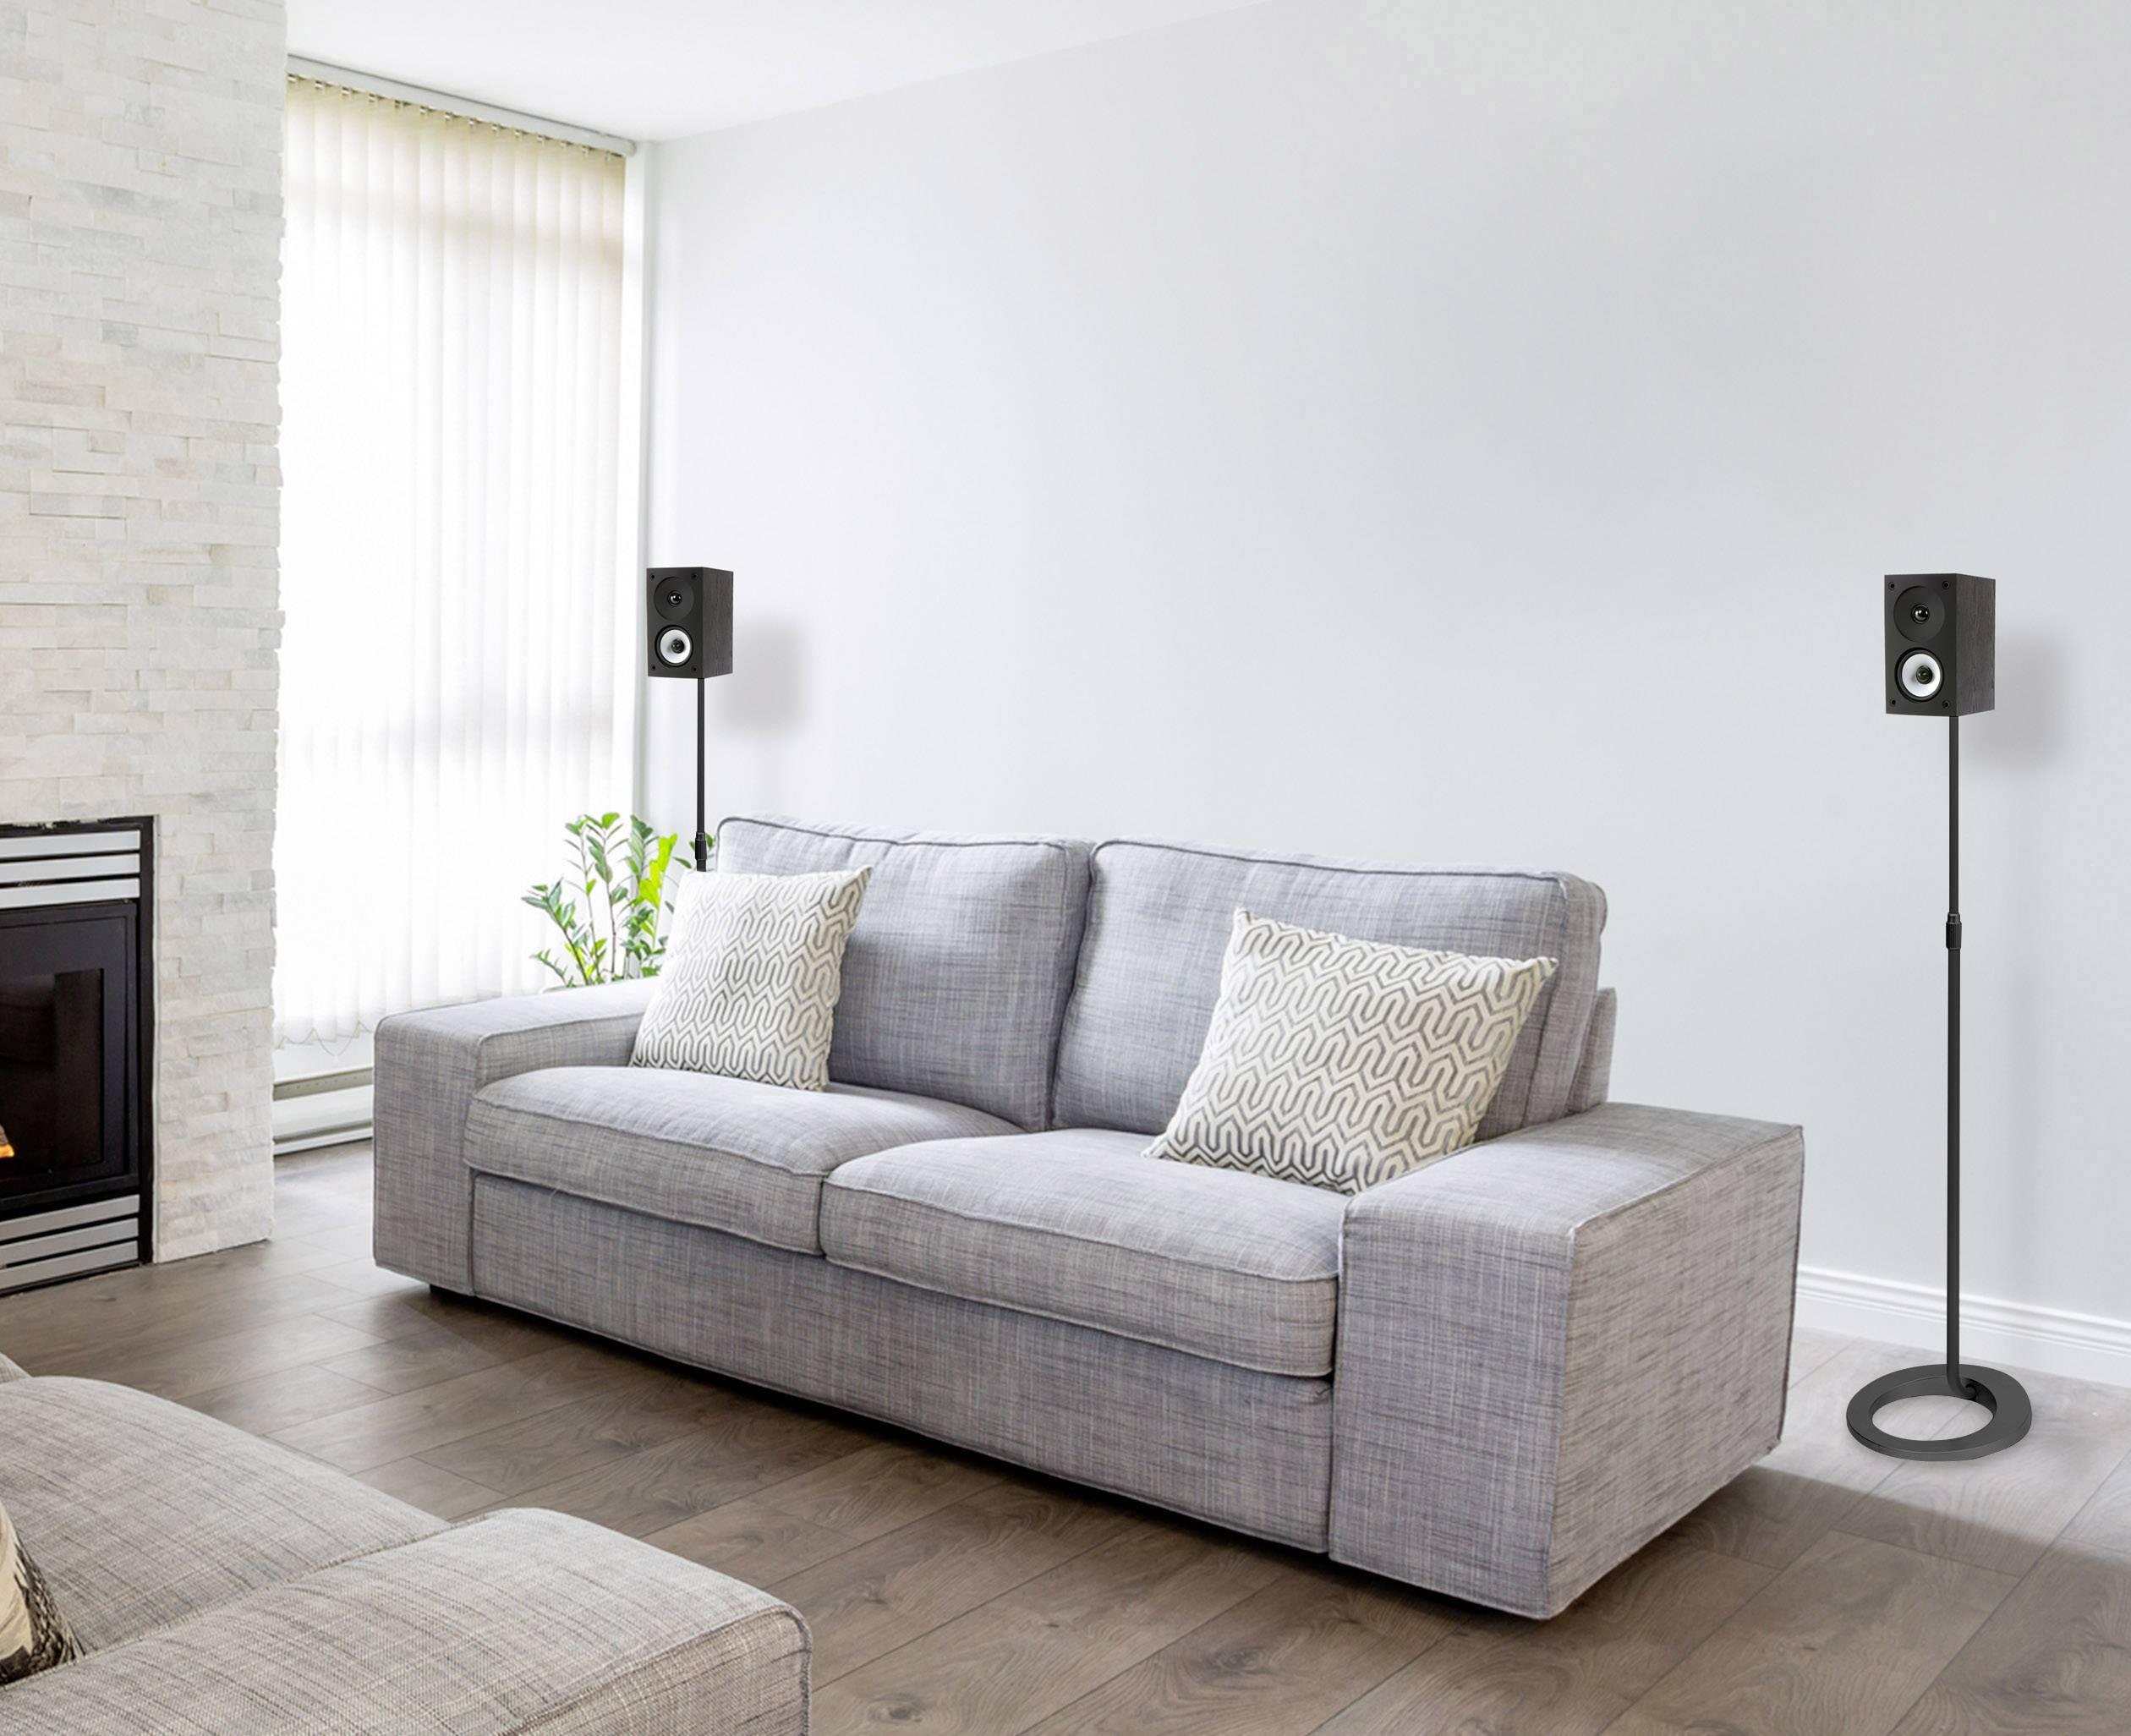 sofa mit boxen amazing sofa mit boxen with sofa mit boxen sofaset infinity eckteil rechts tlg. Black Bedroom Furniture Sets. Home Design Ideas